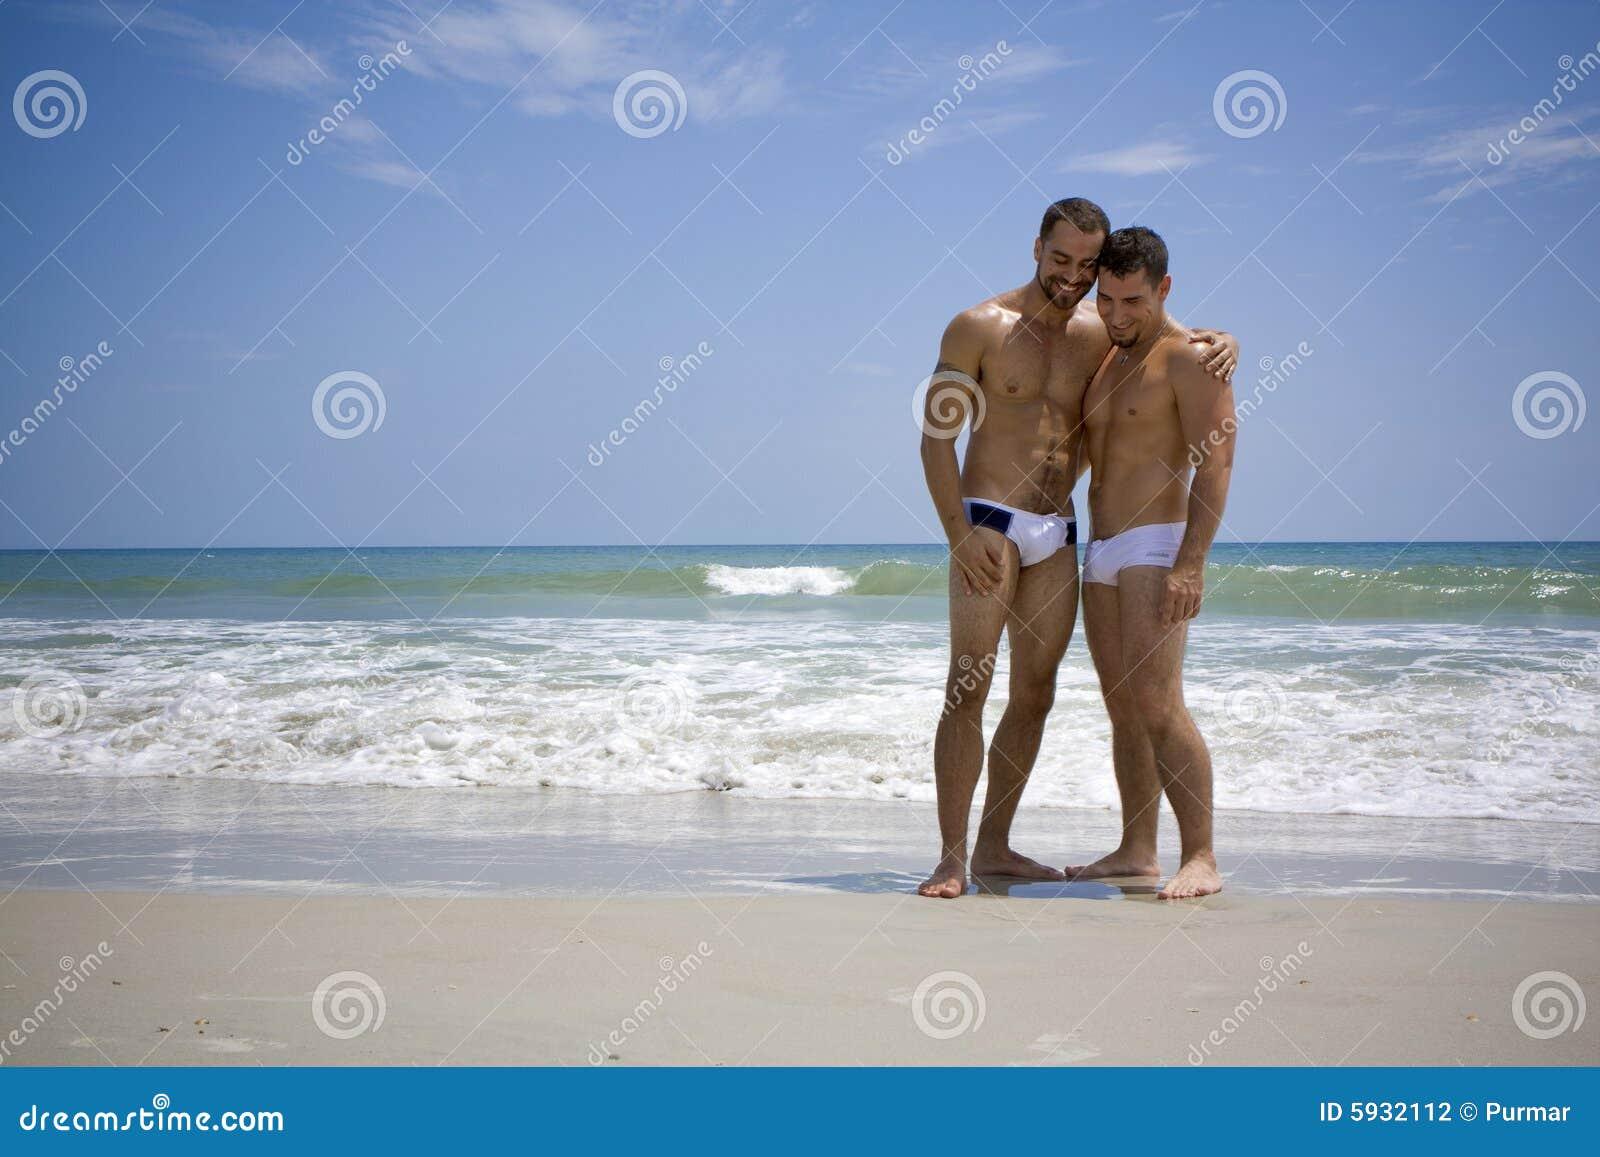 sexe gay romantique Possy noir